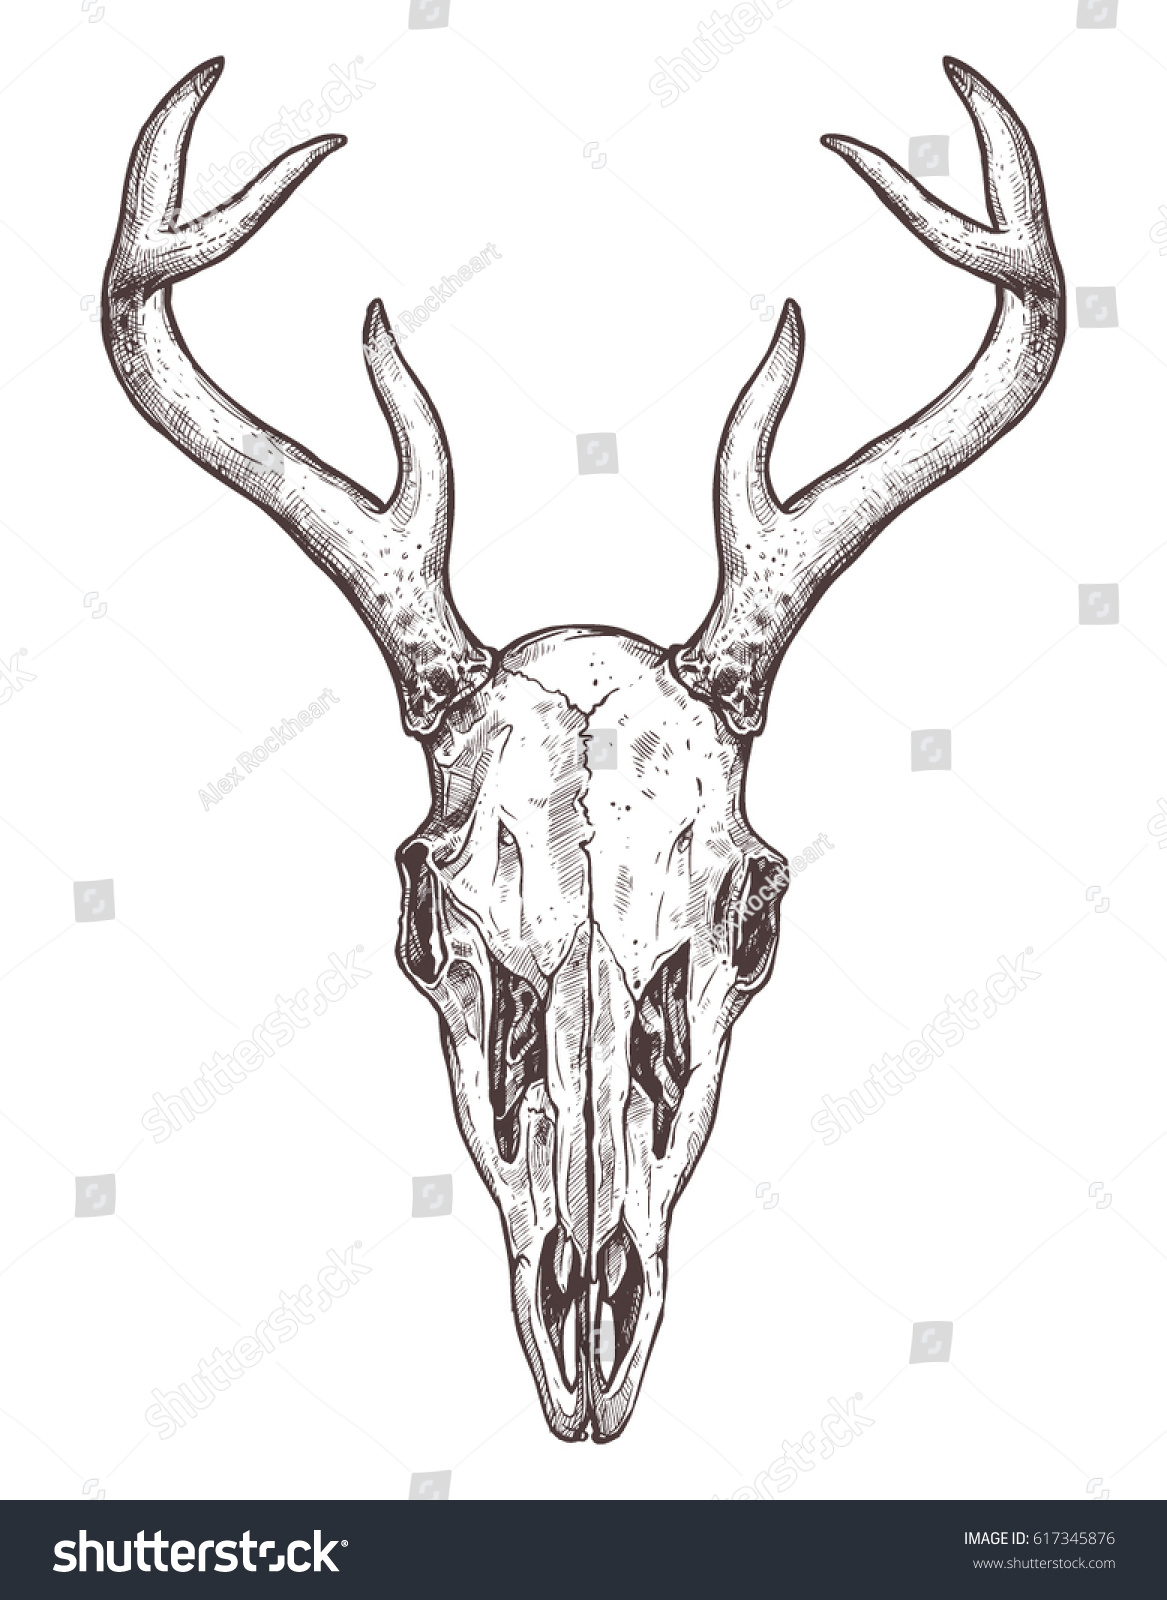 Sketch Deer Skull Boho Hand Drawn Stock Vector 617345876 - Shutterstock